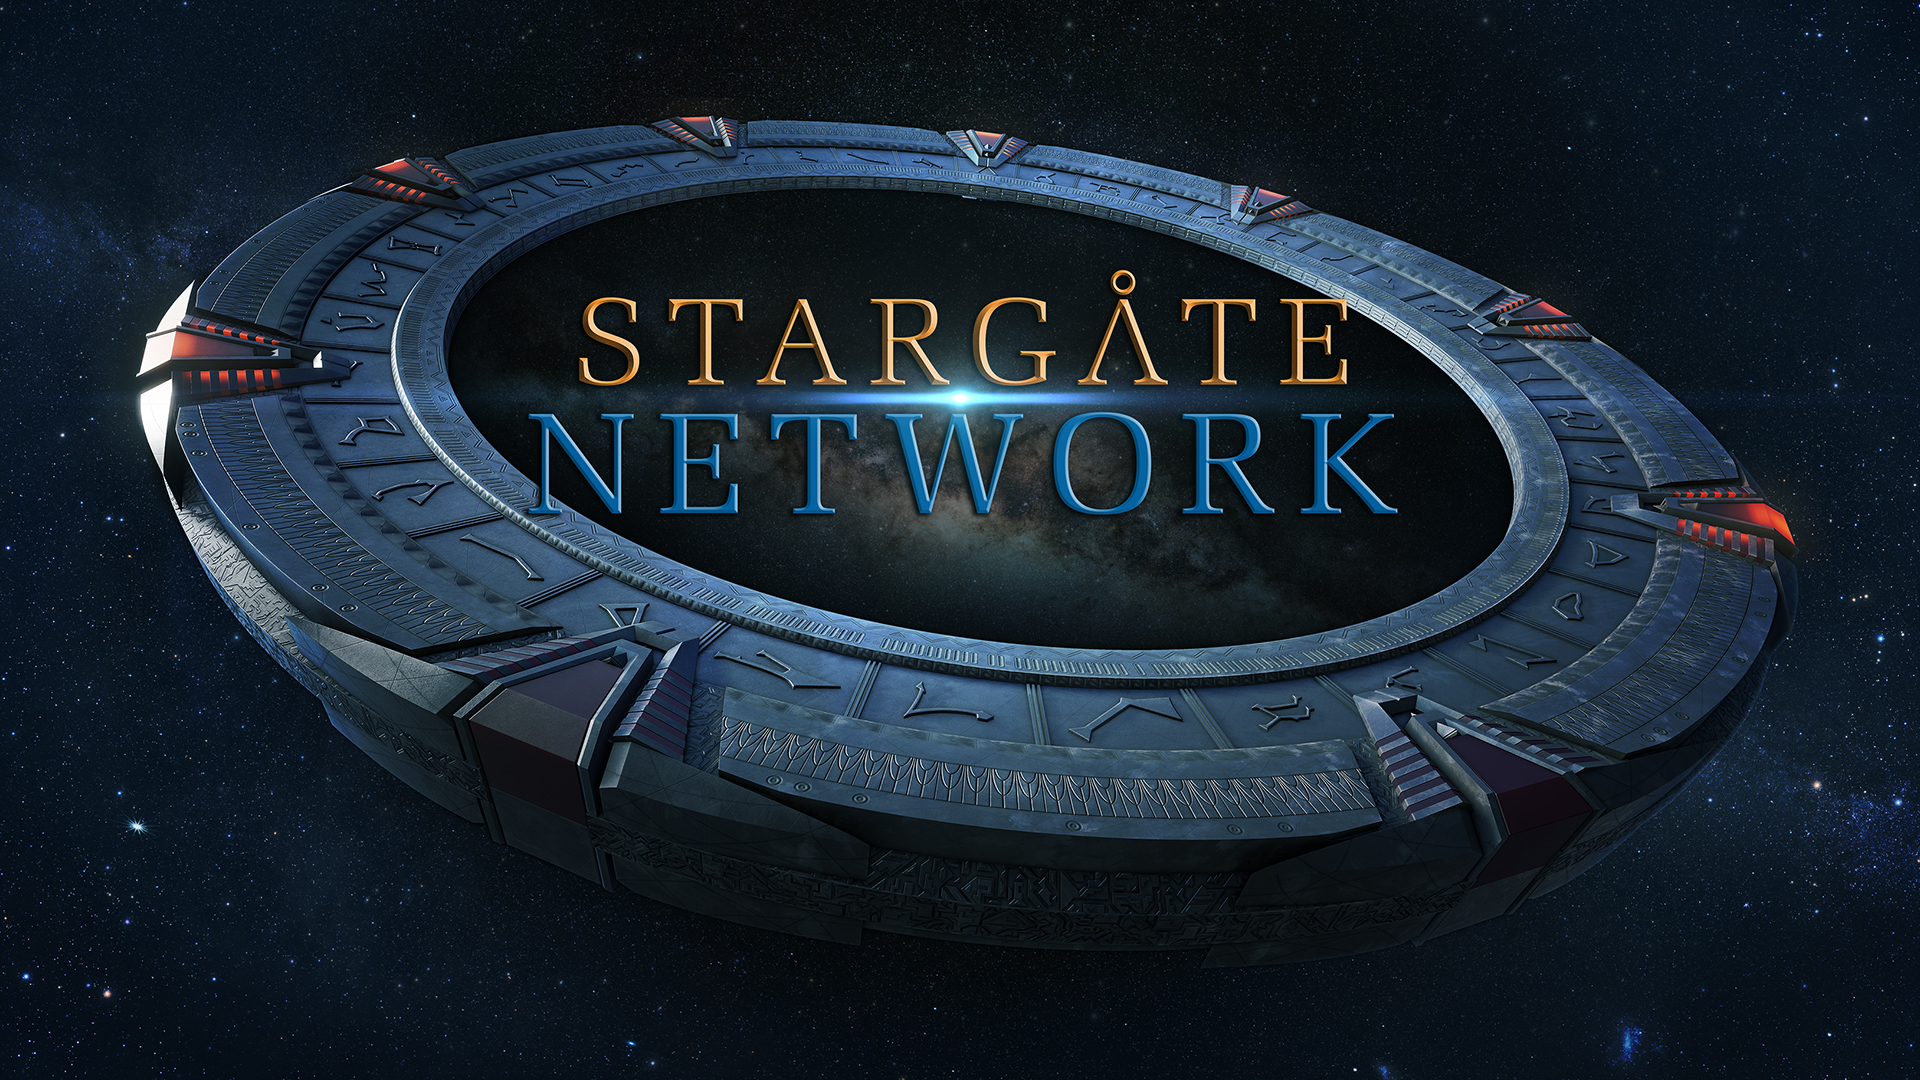 Stargate Wallpaper image - Mod DB